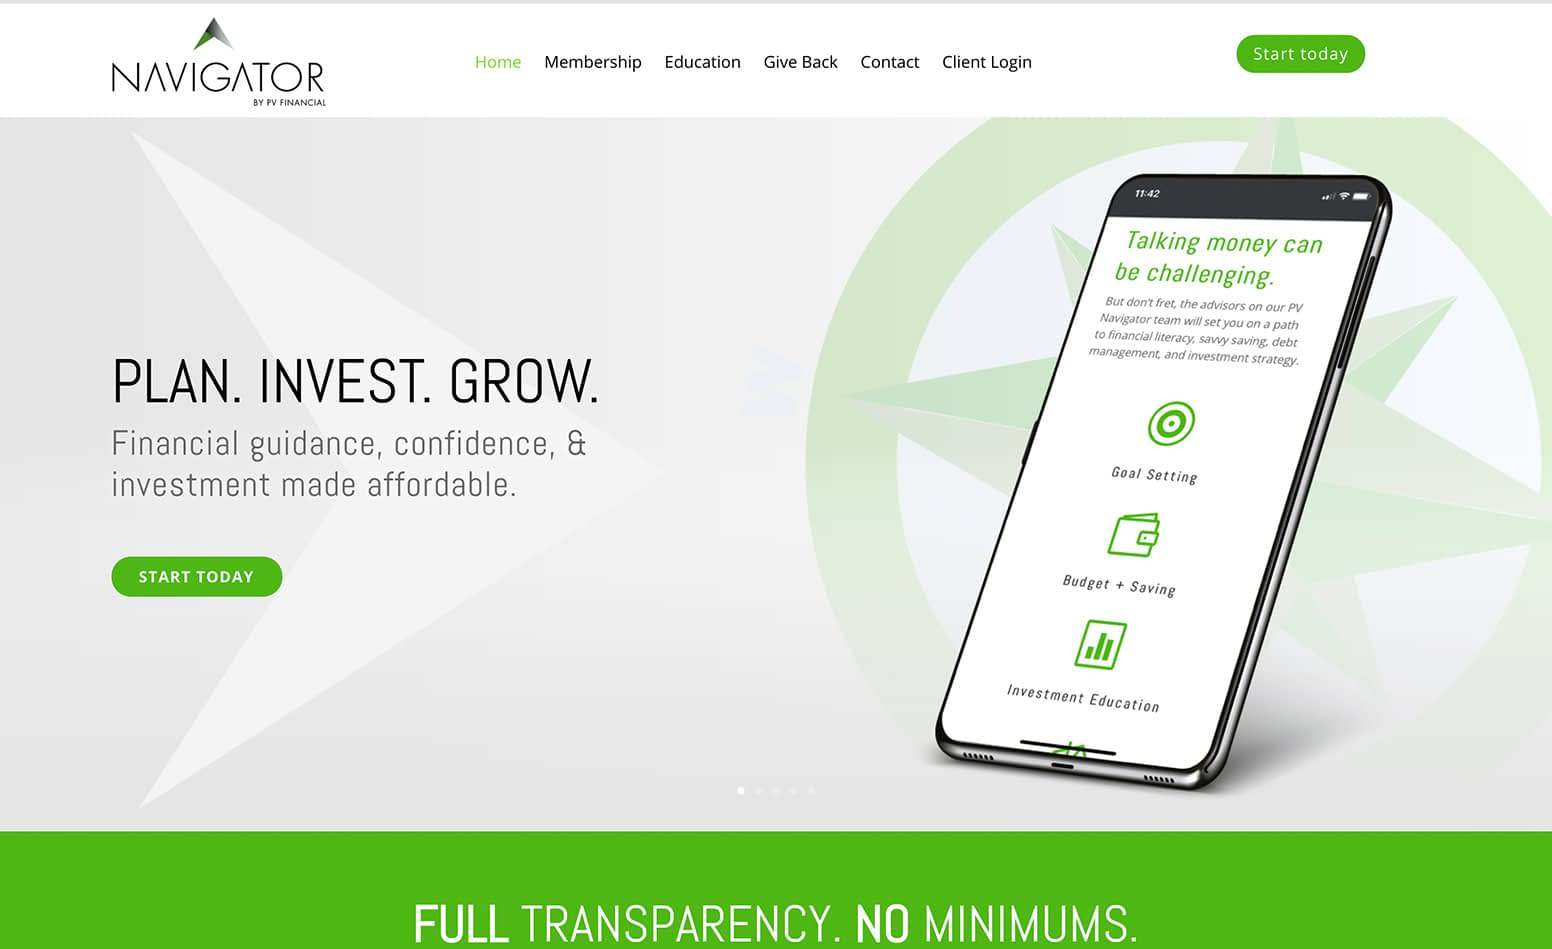 PV Navigator website, custom website design, custom web design, web design Western MA, web design Northern CT, branding, graphic design